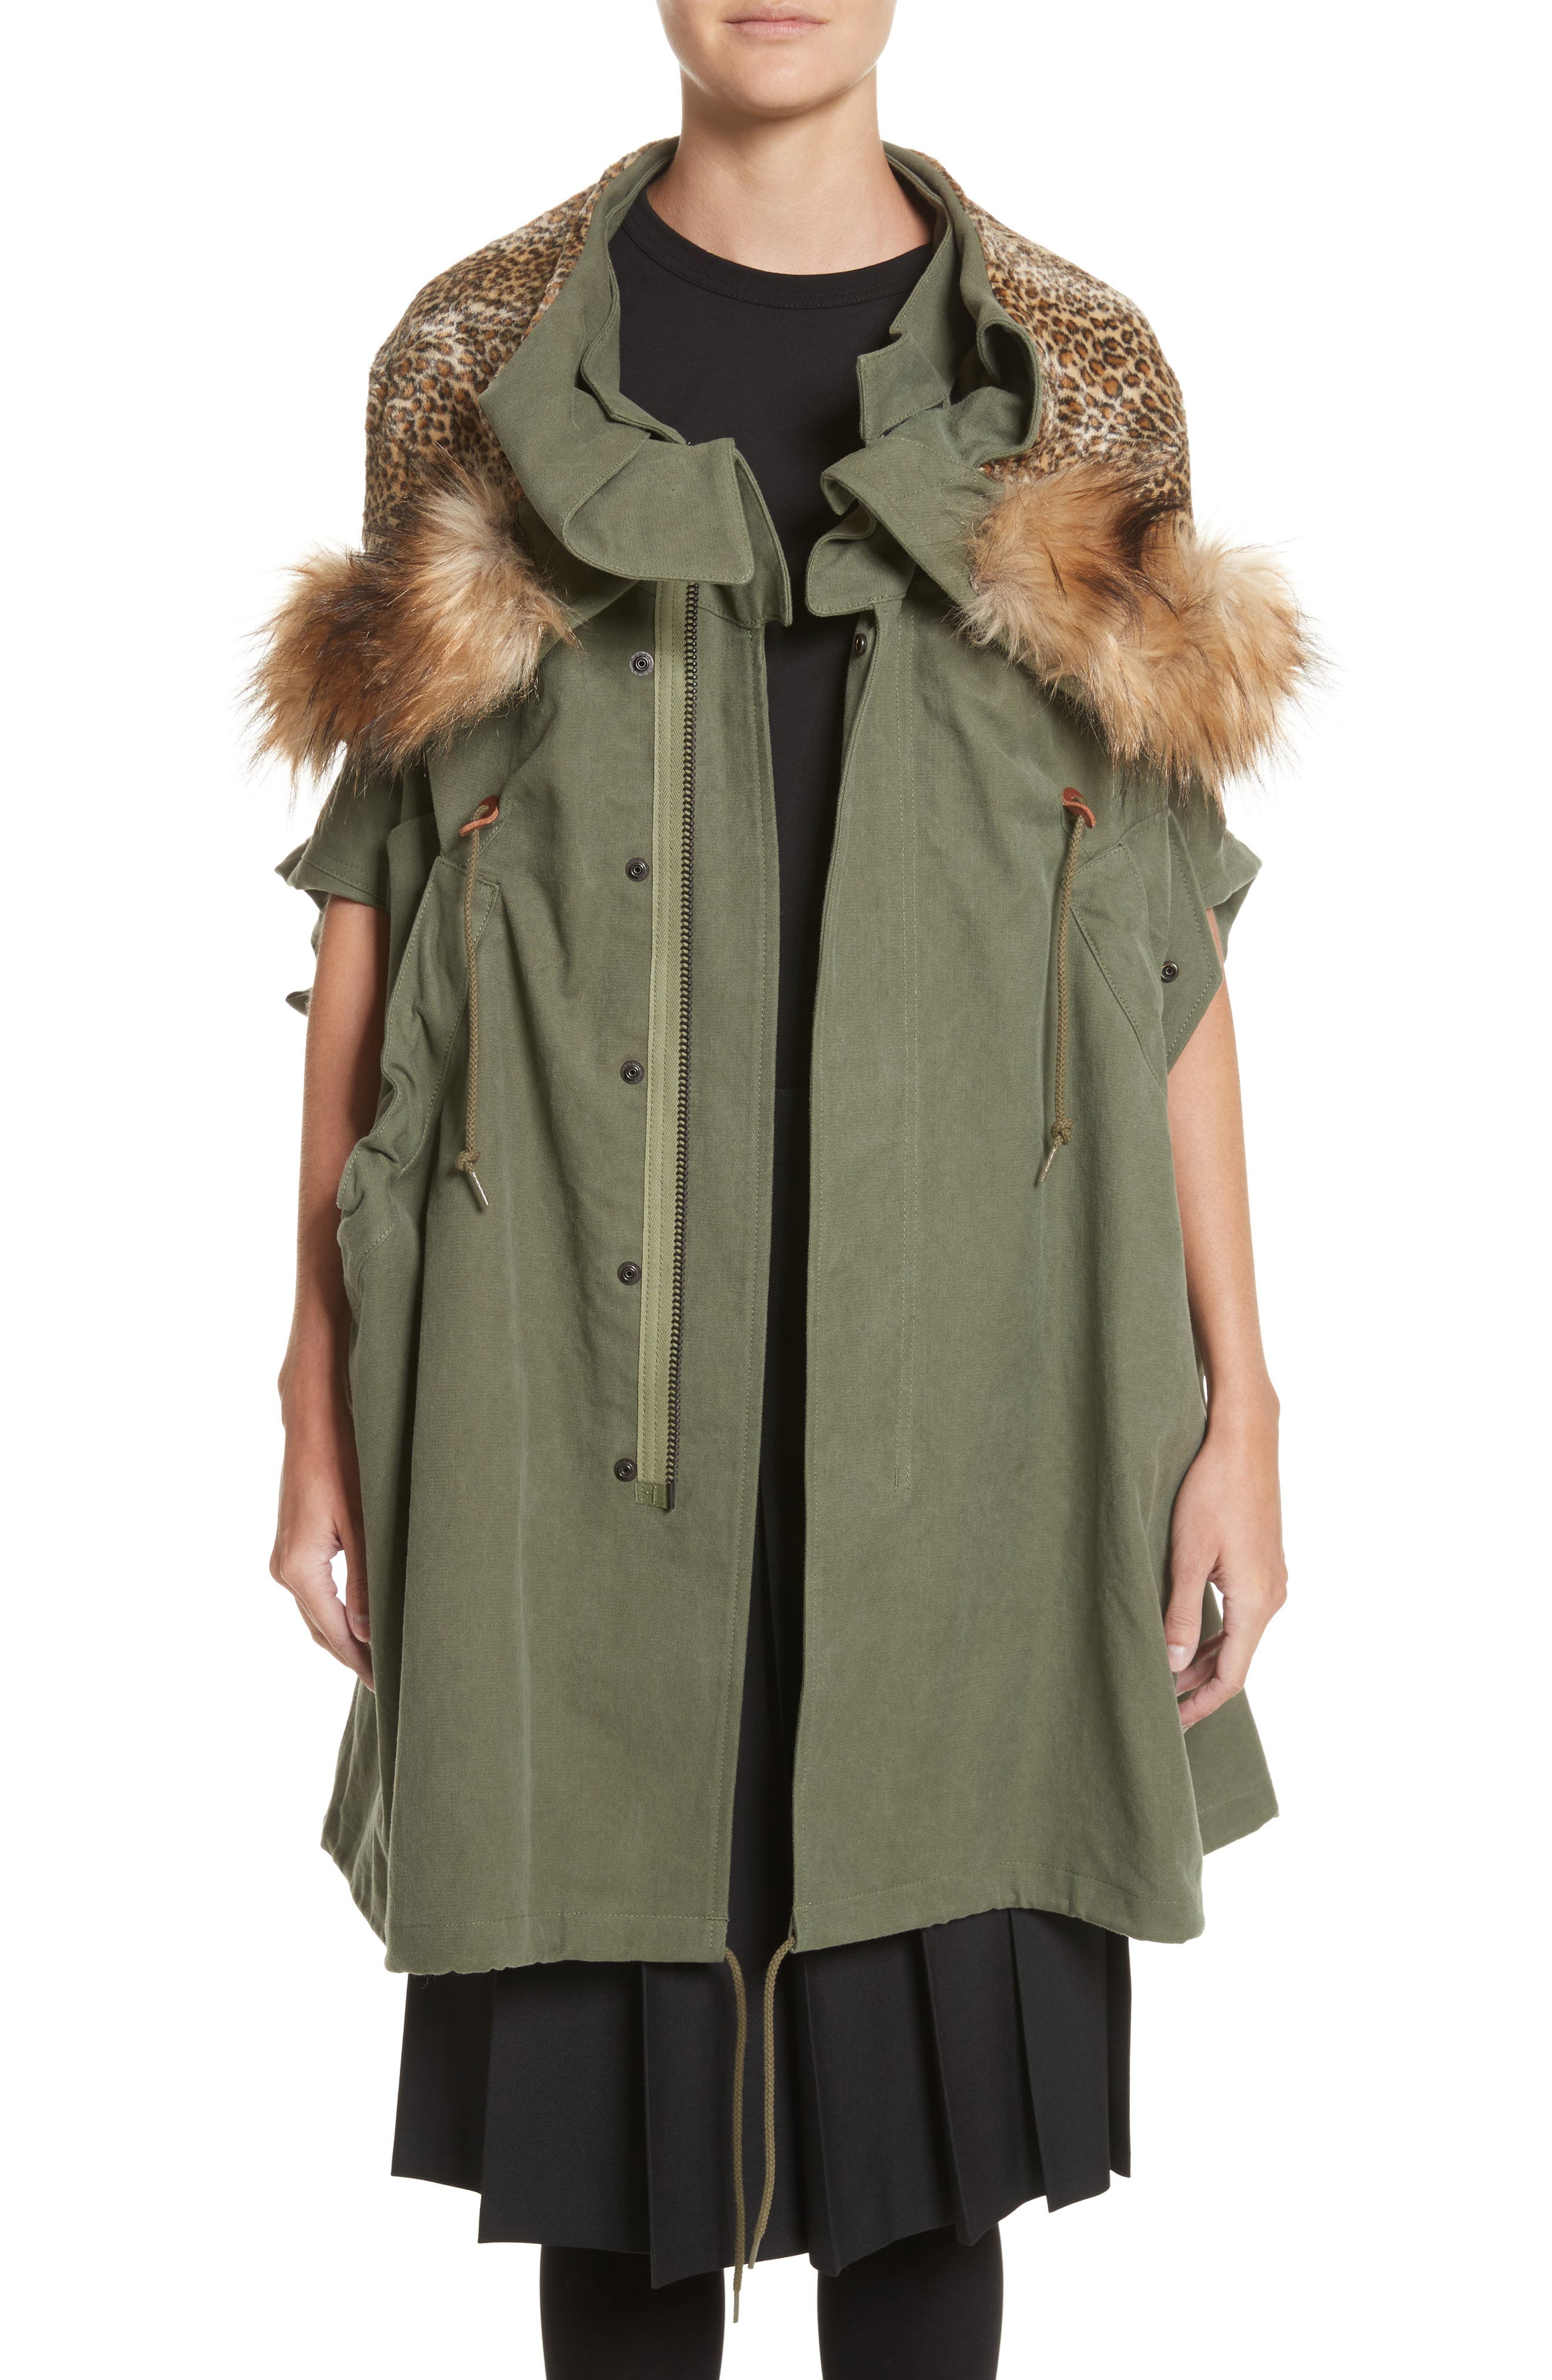 Main Image - Junya Watanabe Army Coat with Cheetah Faux Fur Hood